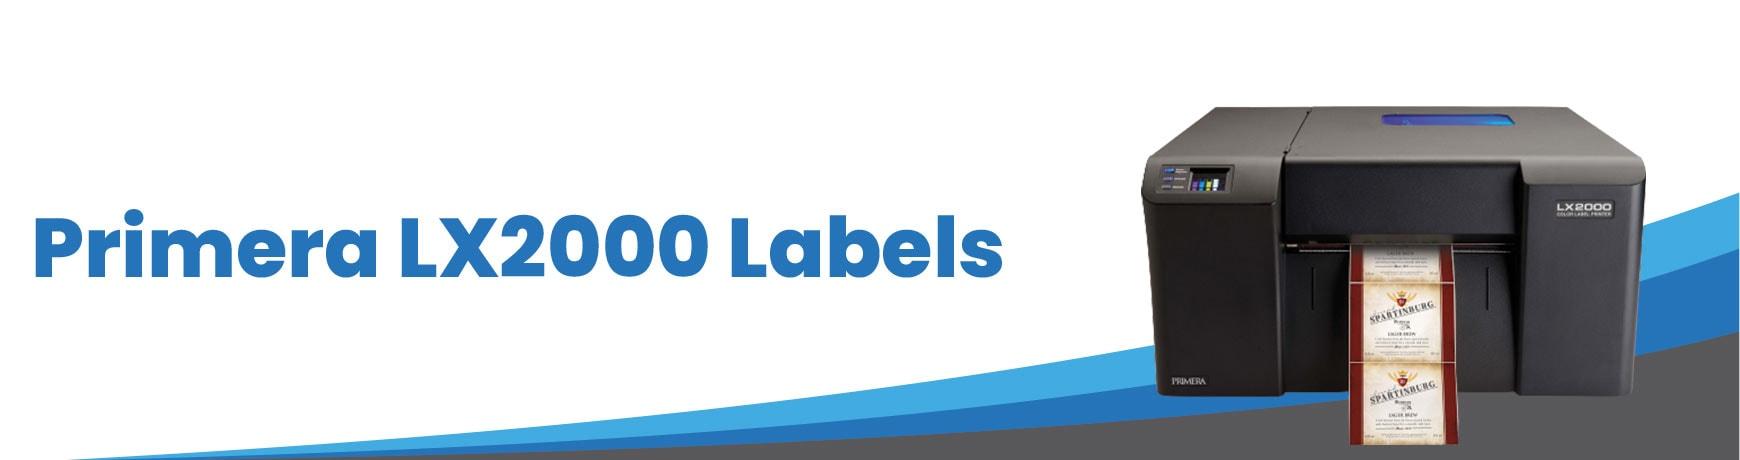 Primera LX2000/LX3000 Labels